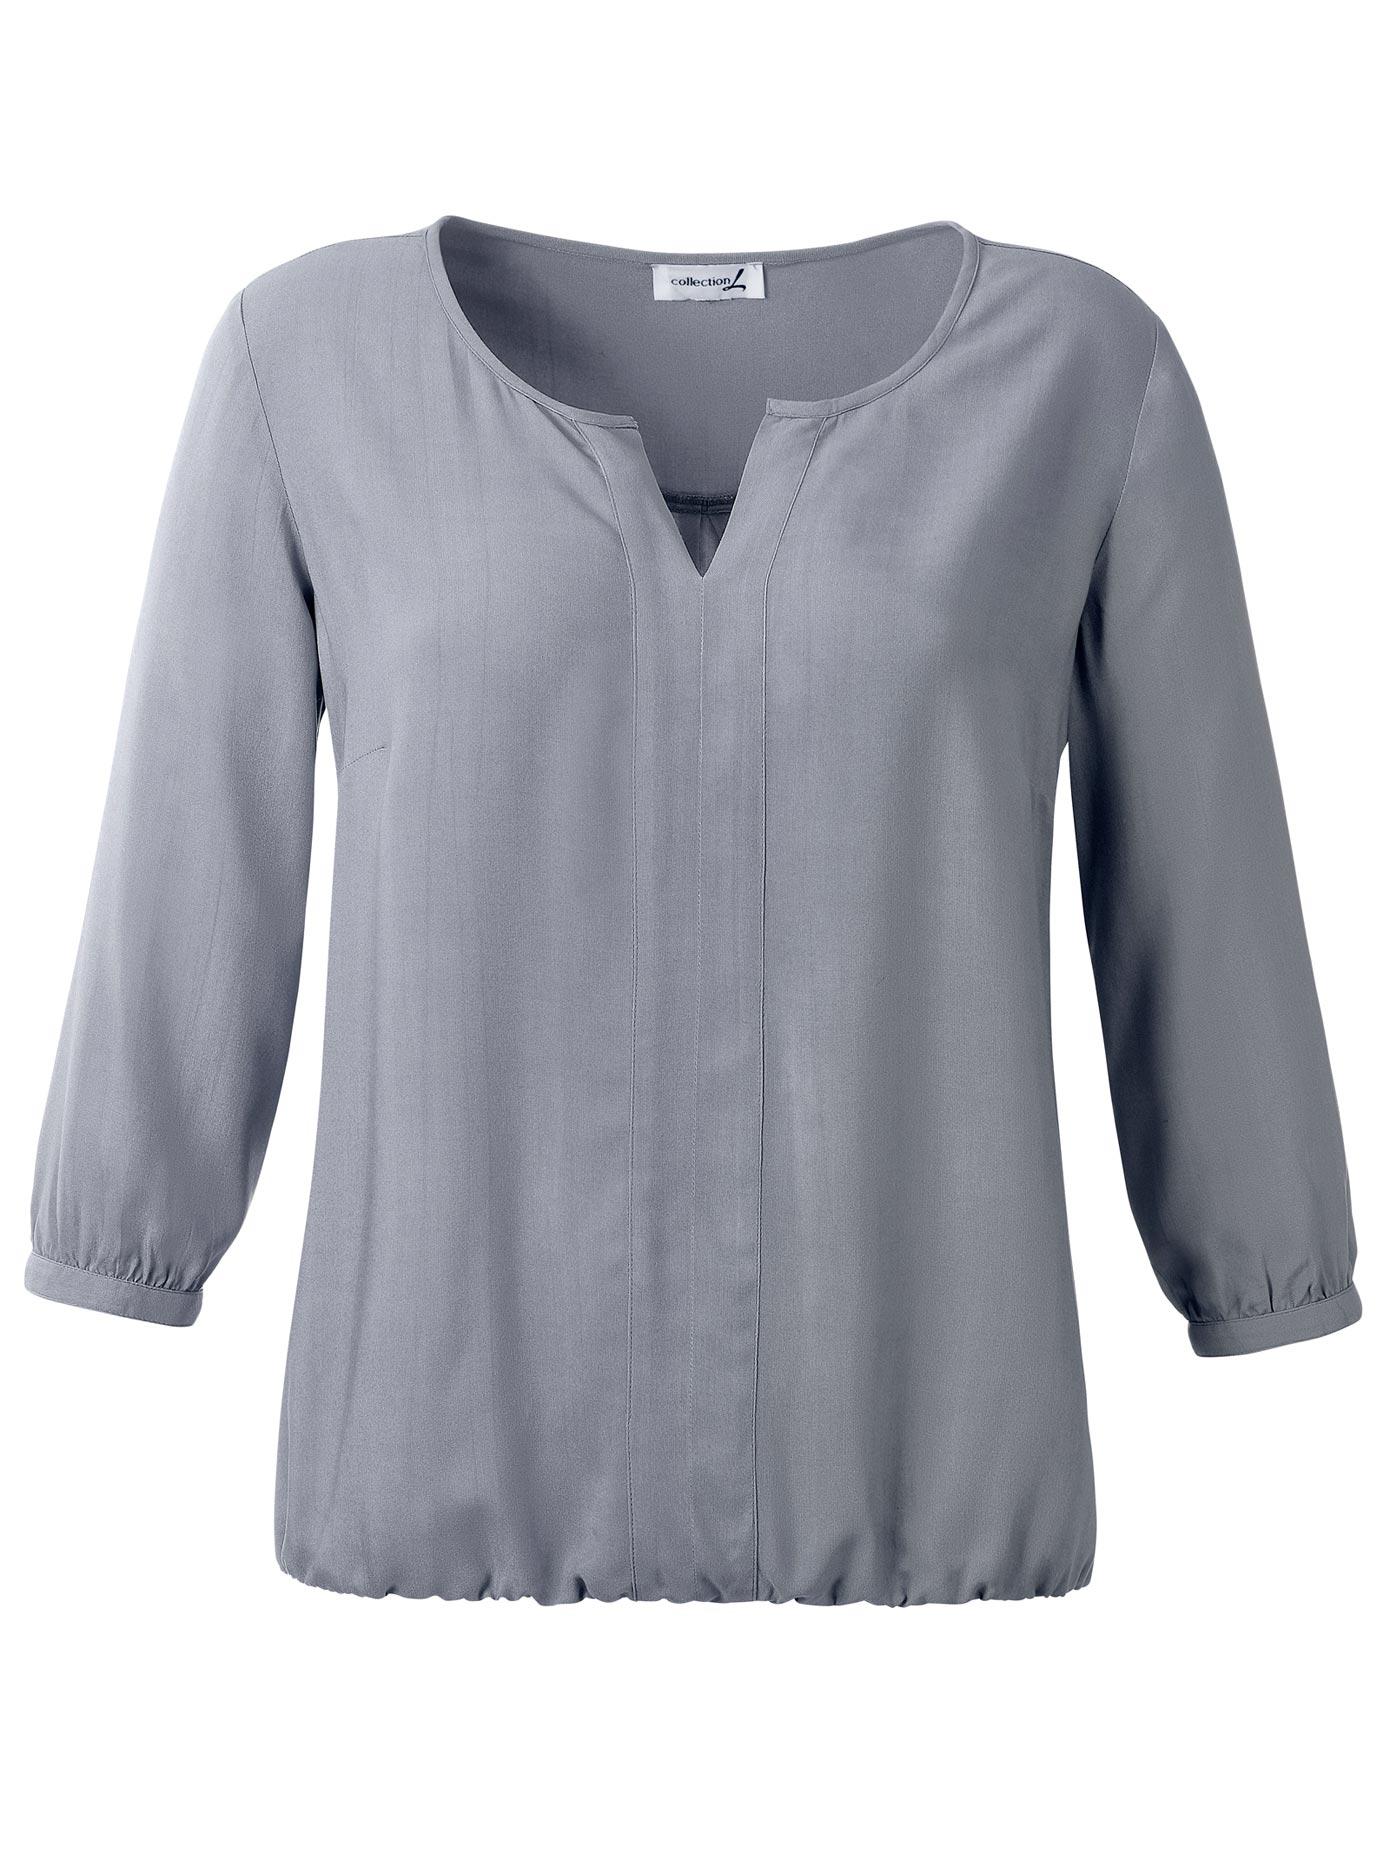 Casual Looks Bluse mit Gummizug am Saum Damenmode/Bekleidung/Blusen & Tuniken/Blusen/3/4 arm Blusen